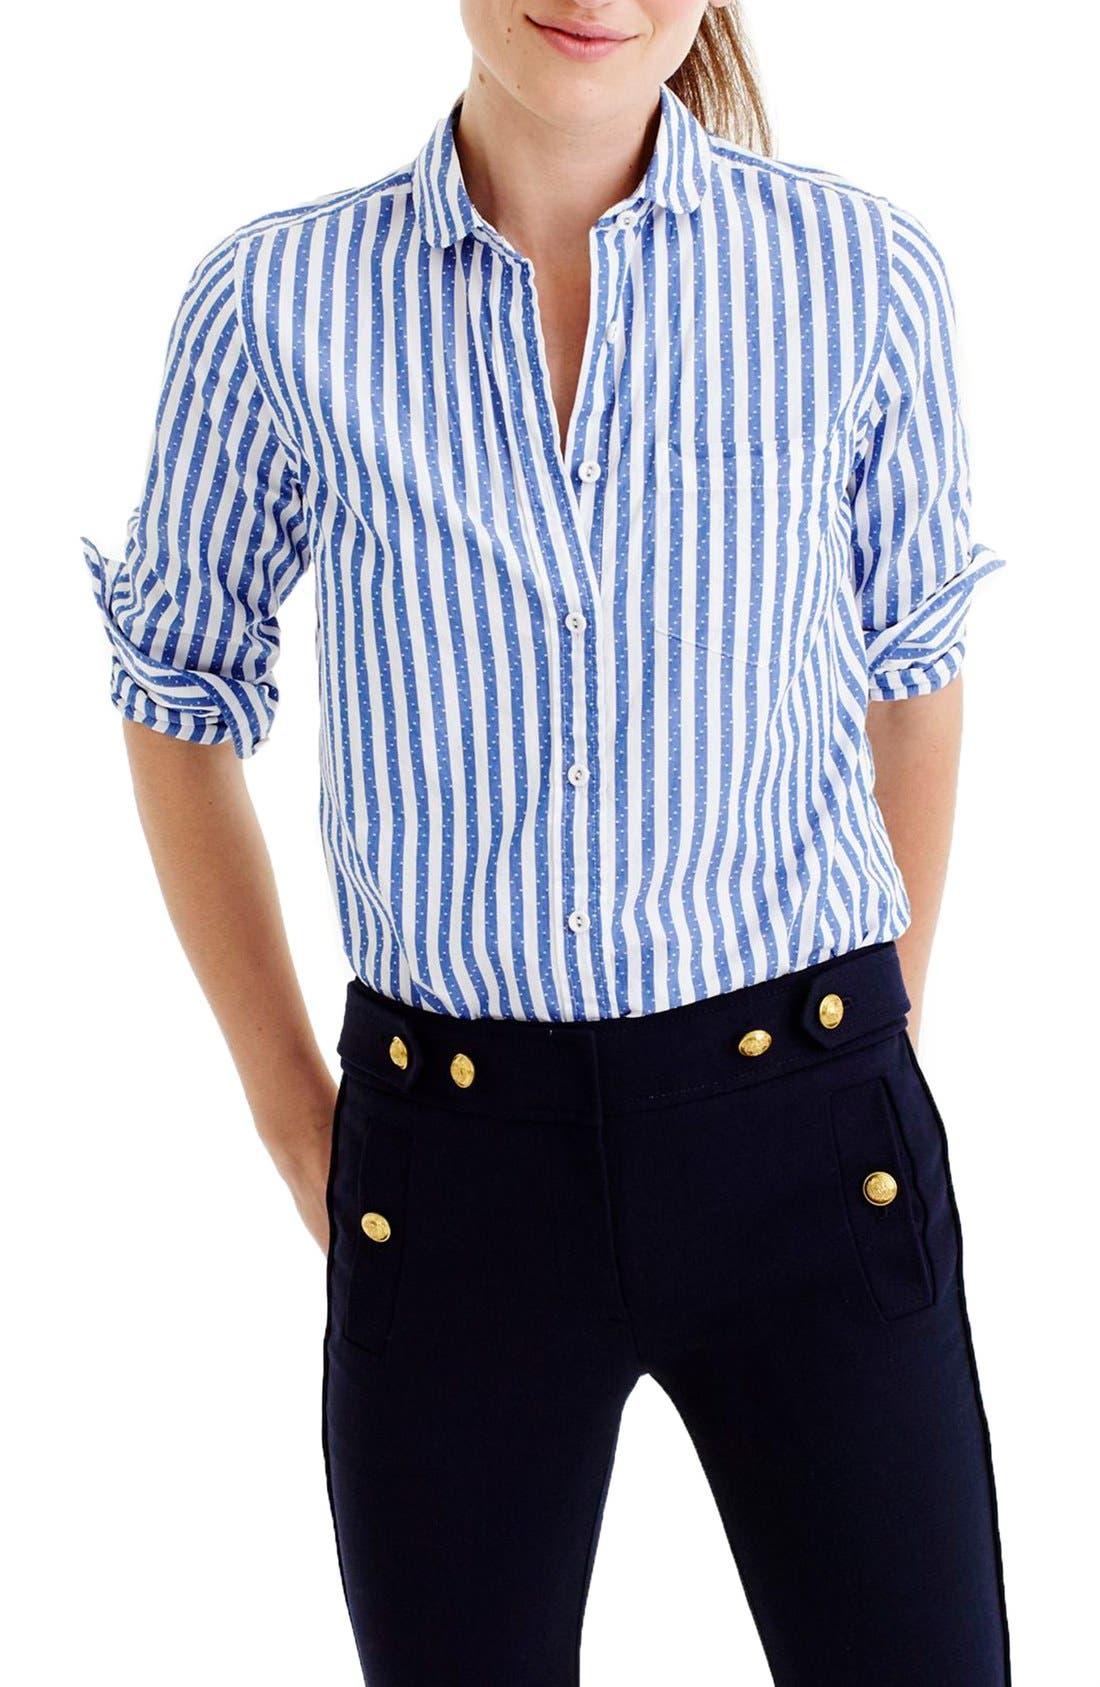 Main Image - J.Crew Club Collar Jacquard Stripe Boy Shirt (Regular & Petite)